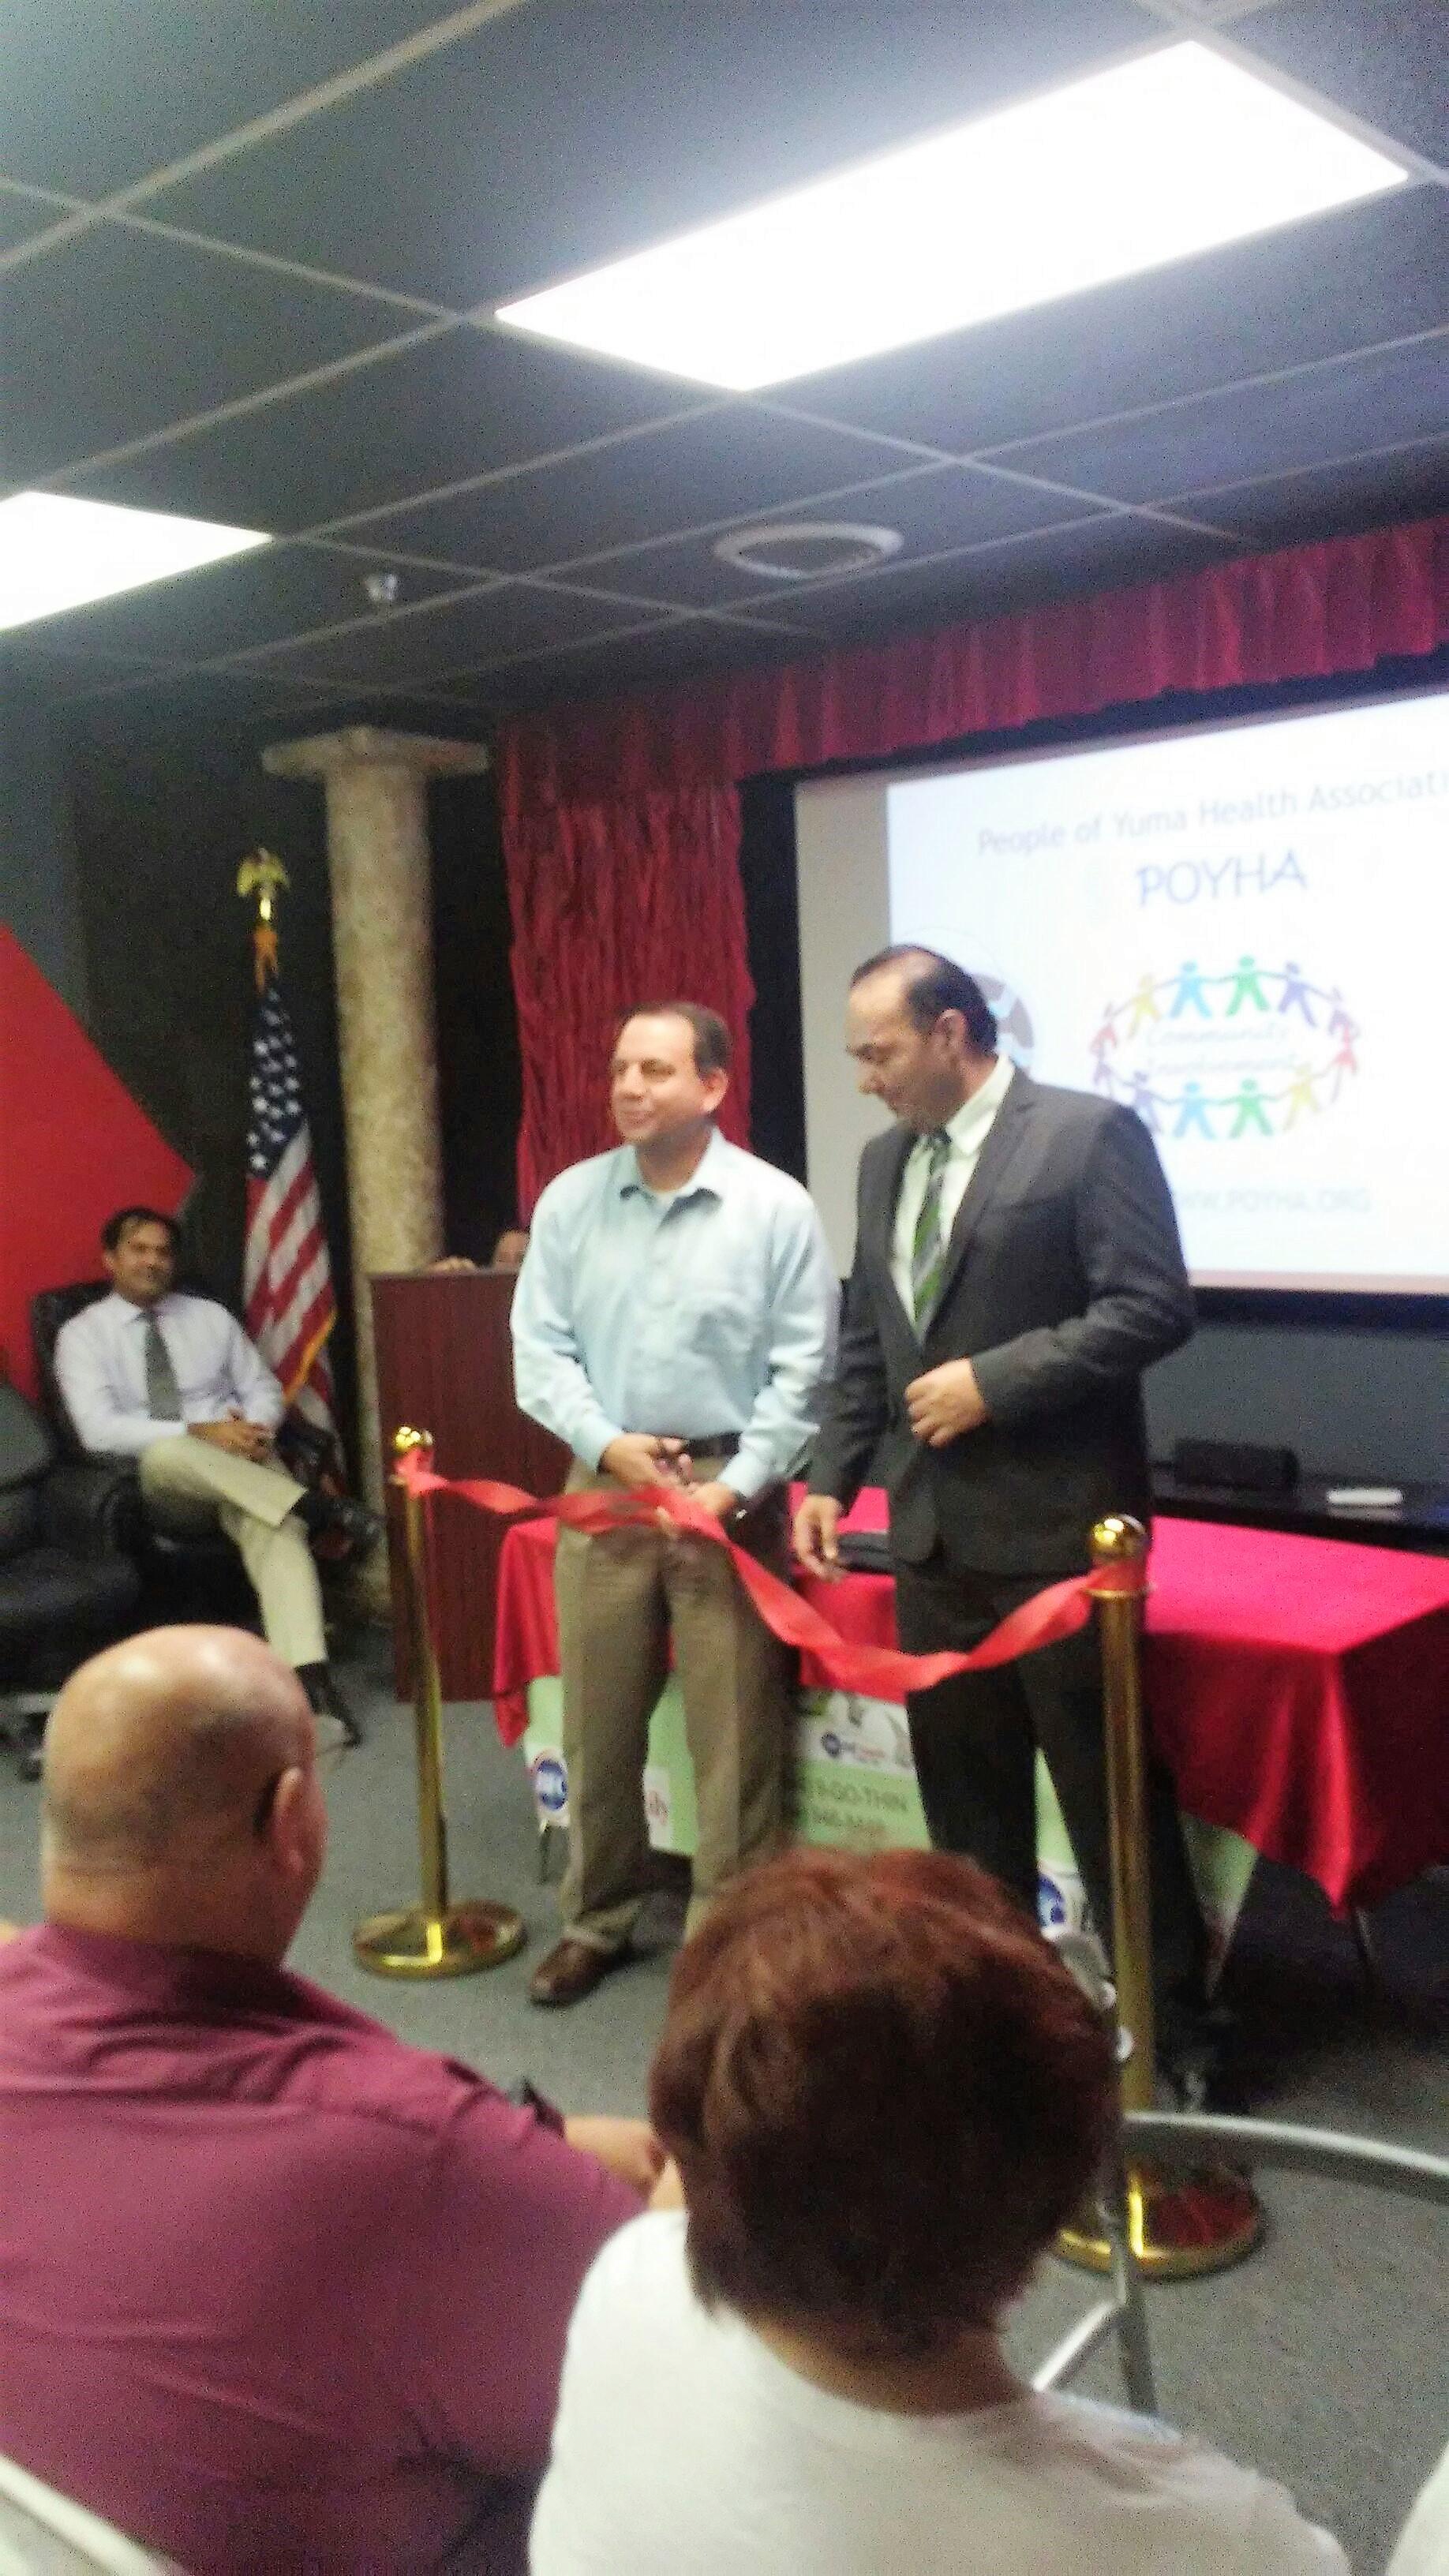 City of Yuma Mayor Douglas J. Nicholls attends POYHA opening ceremony